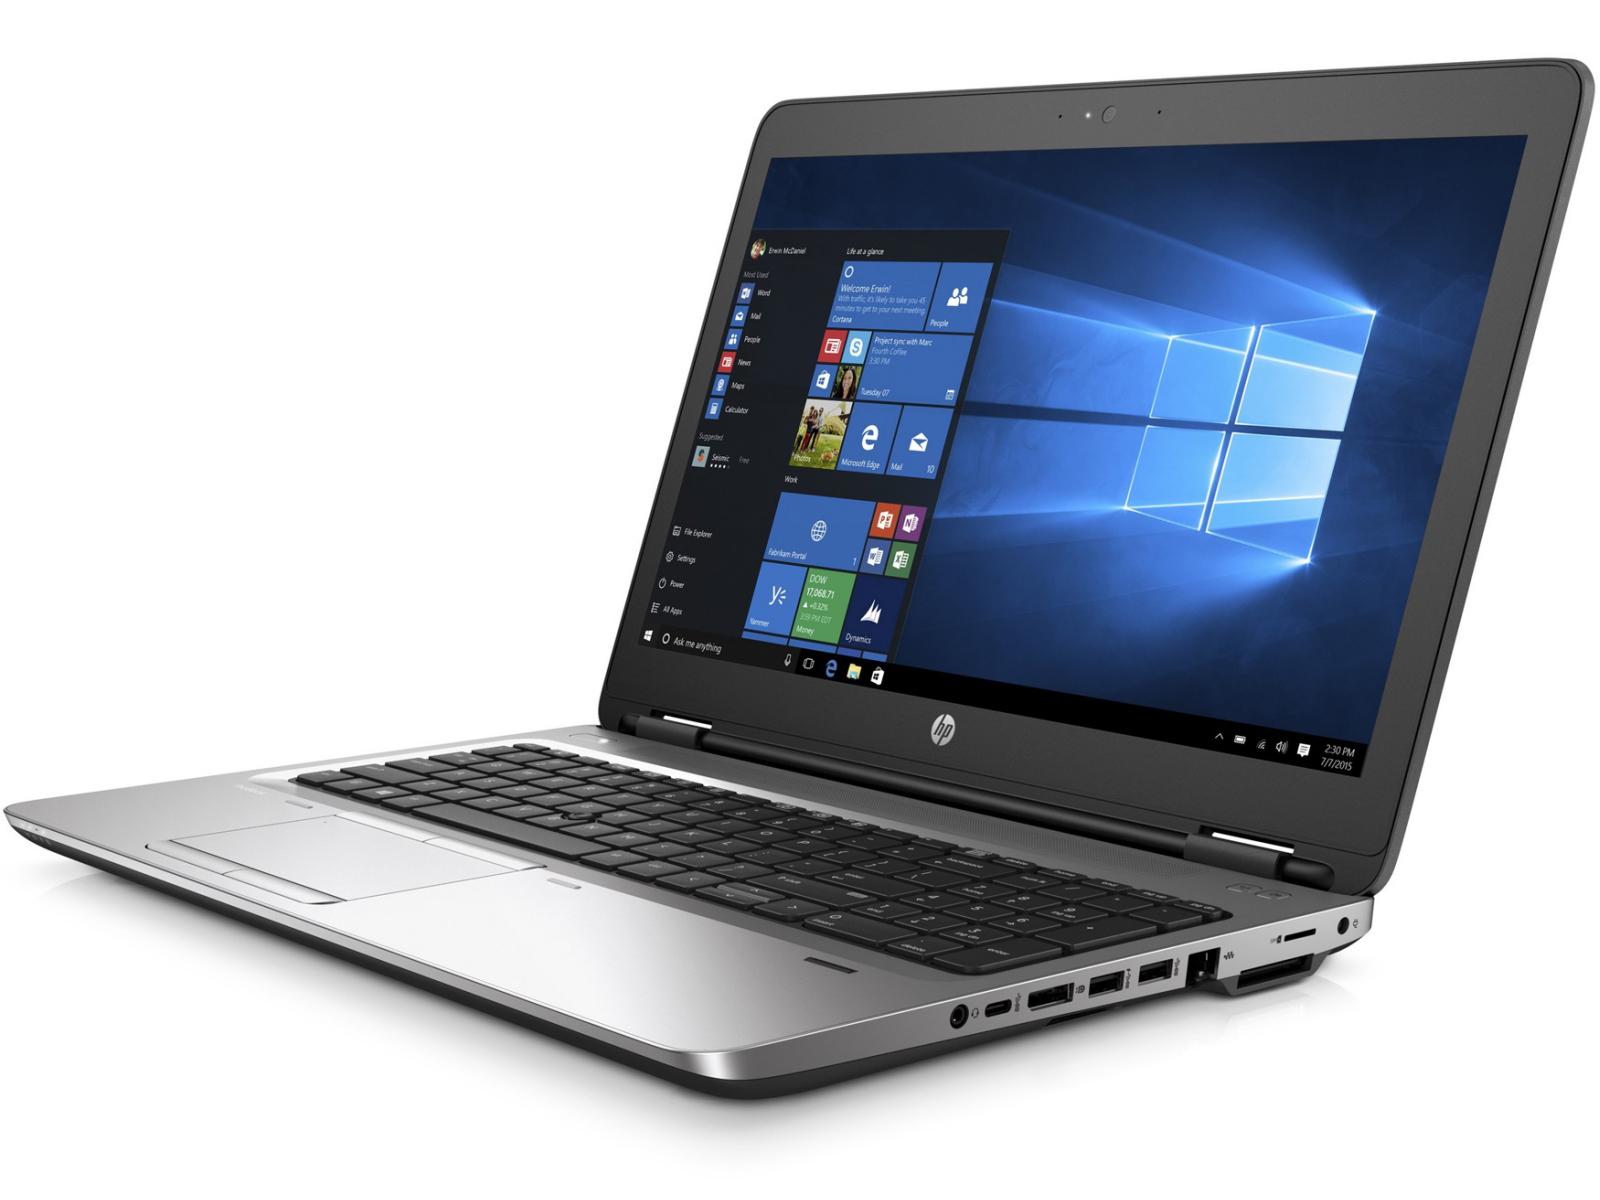 HP ProBook 655 G2 T9X09ET Notebook Review Reviews